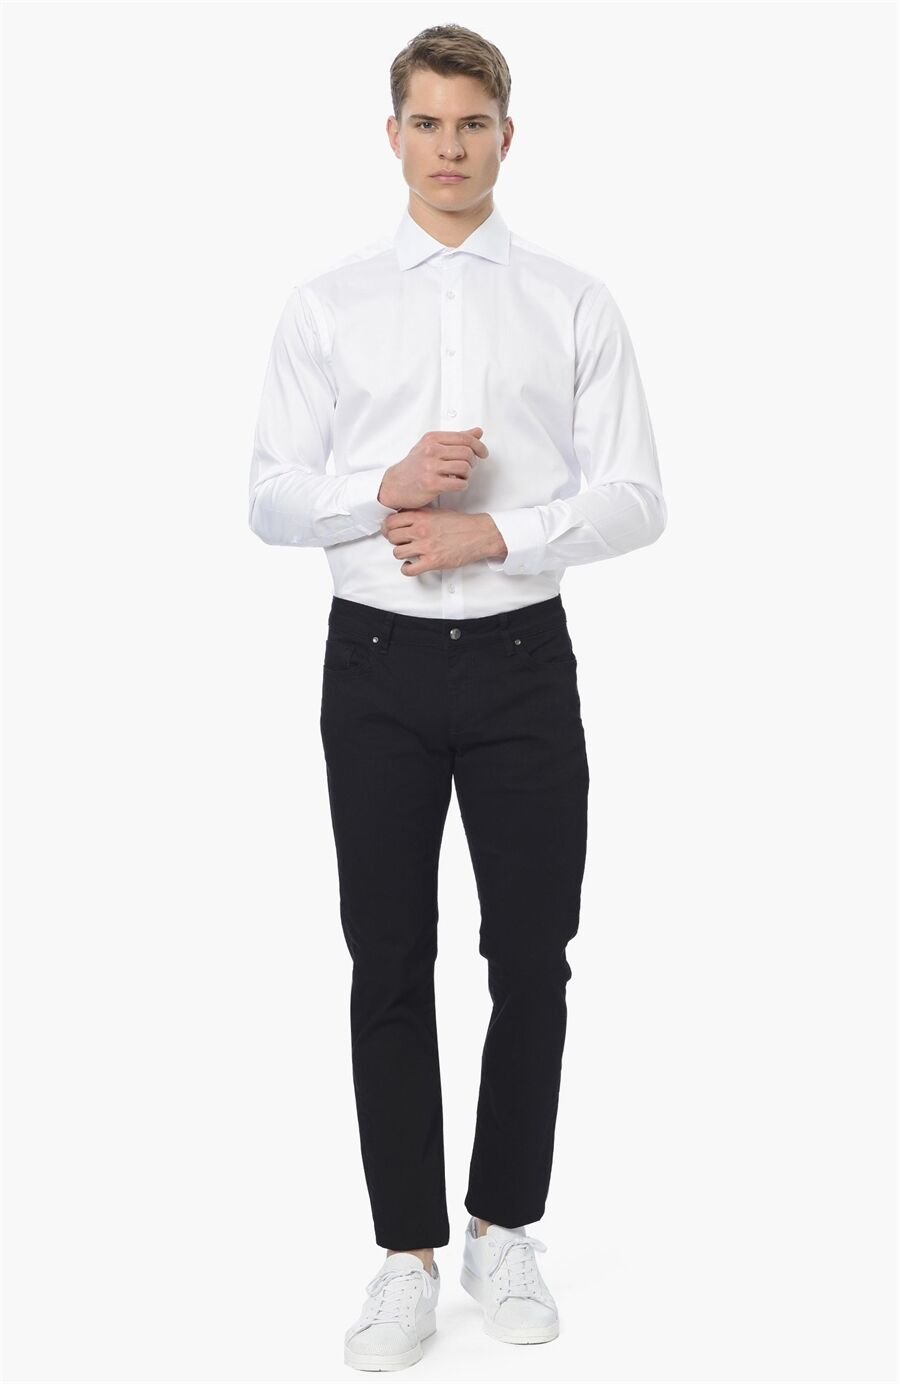 Diyagonal Slım Fit Siyah Casual Pantolon